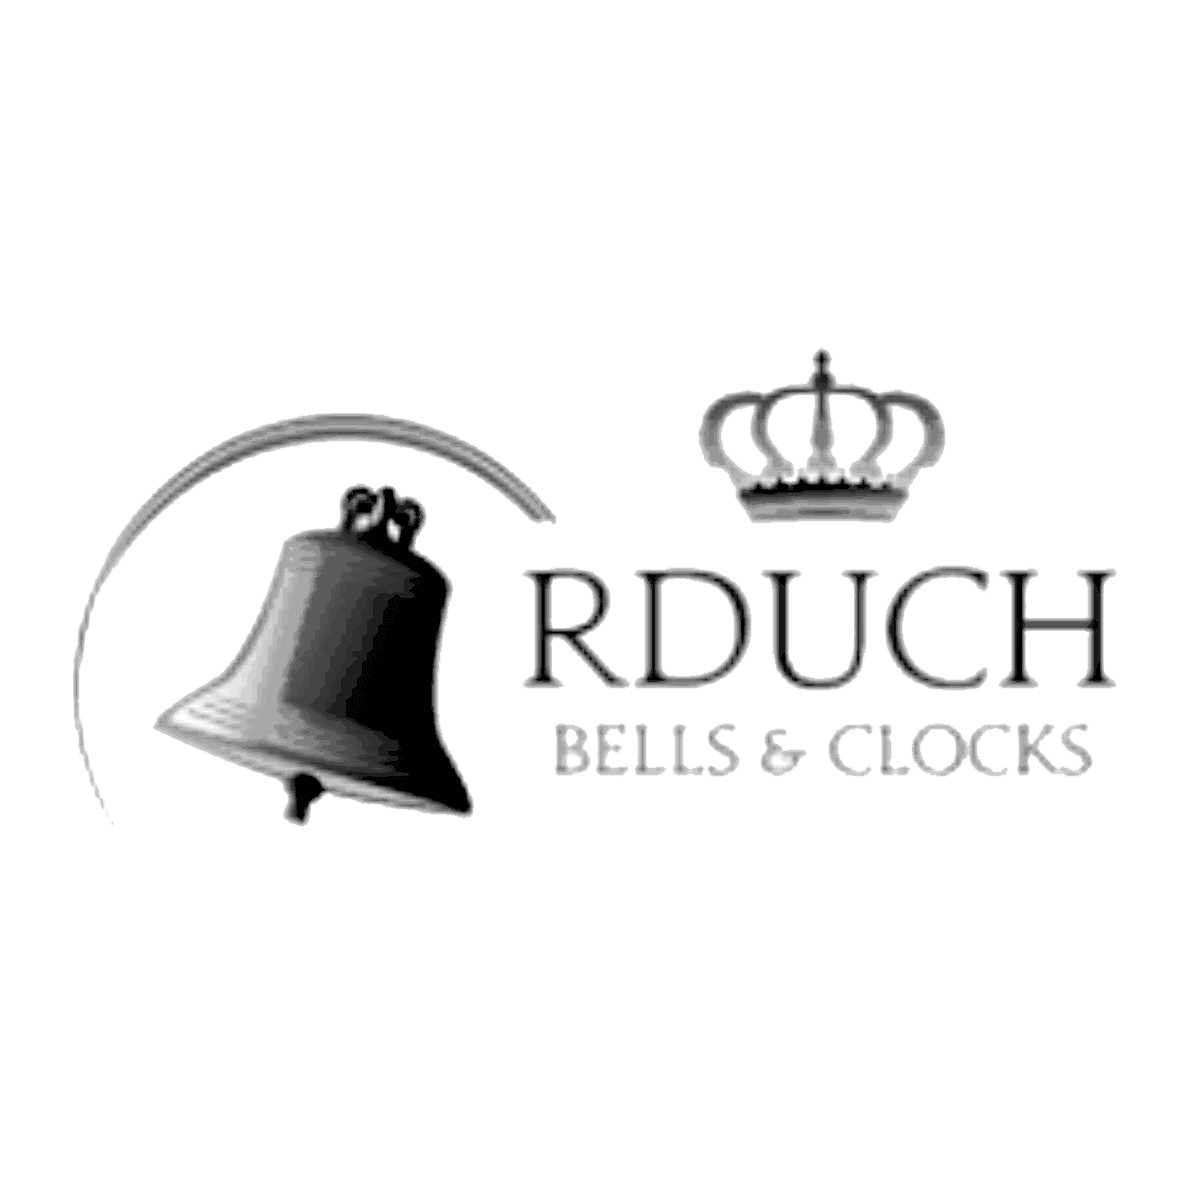 Rduch Bells & Clocks